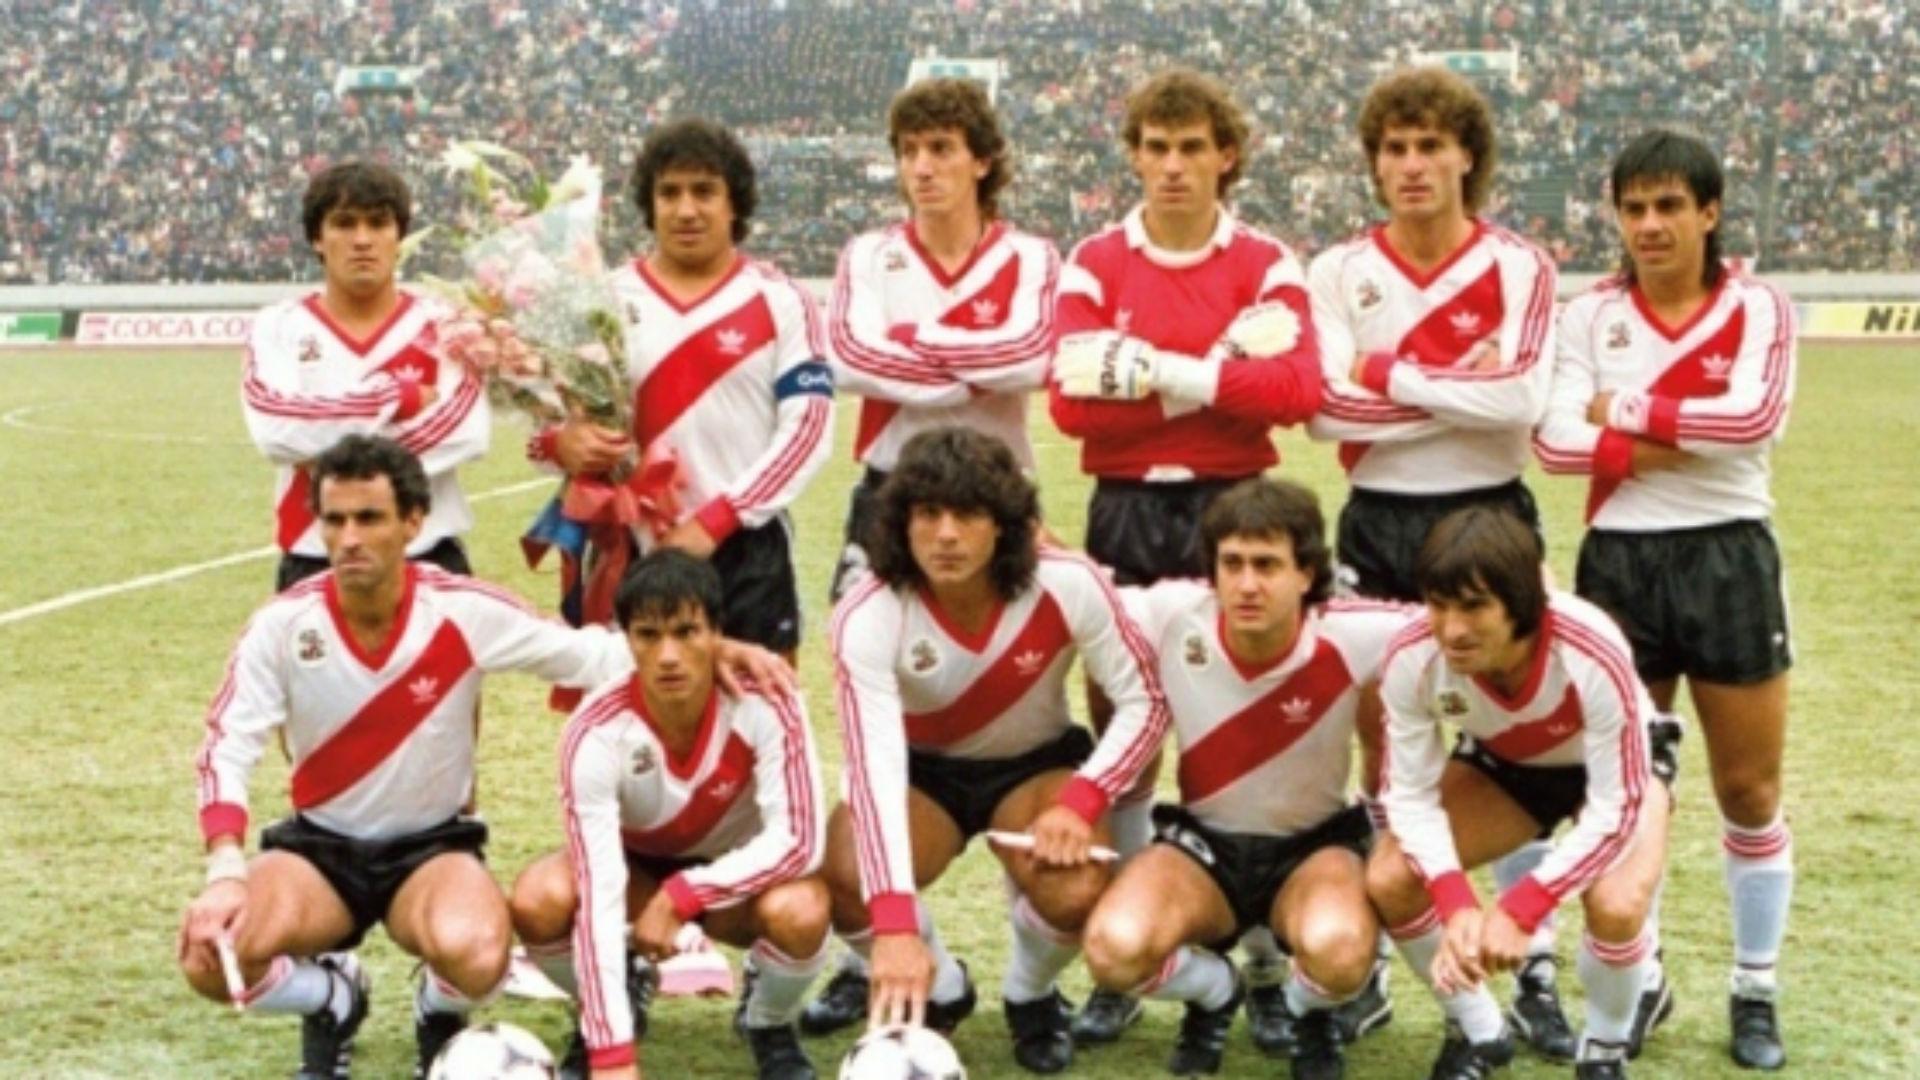 River 1986 equipo